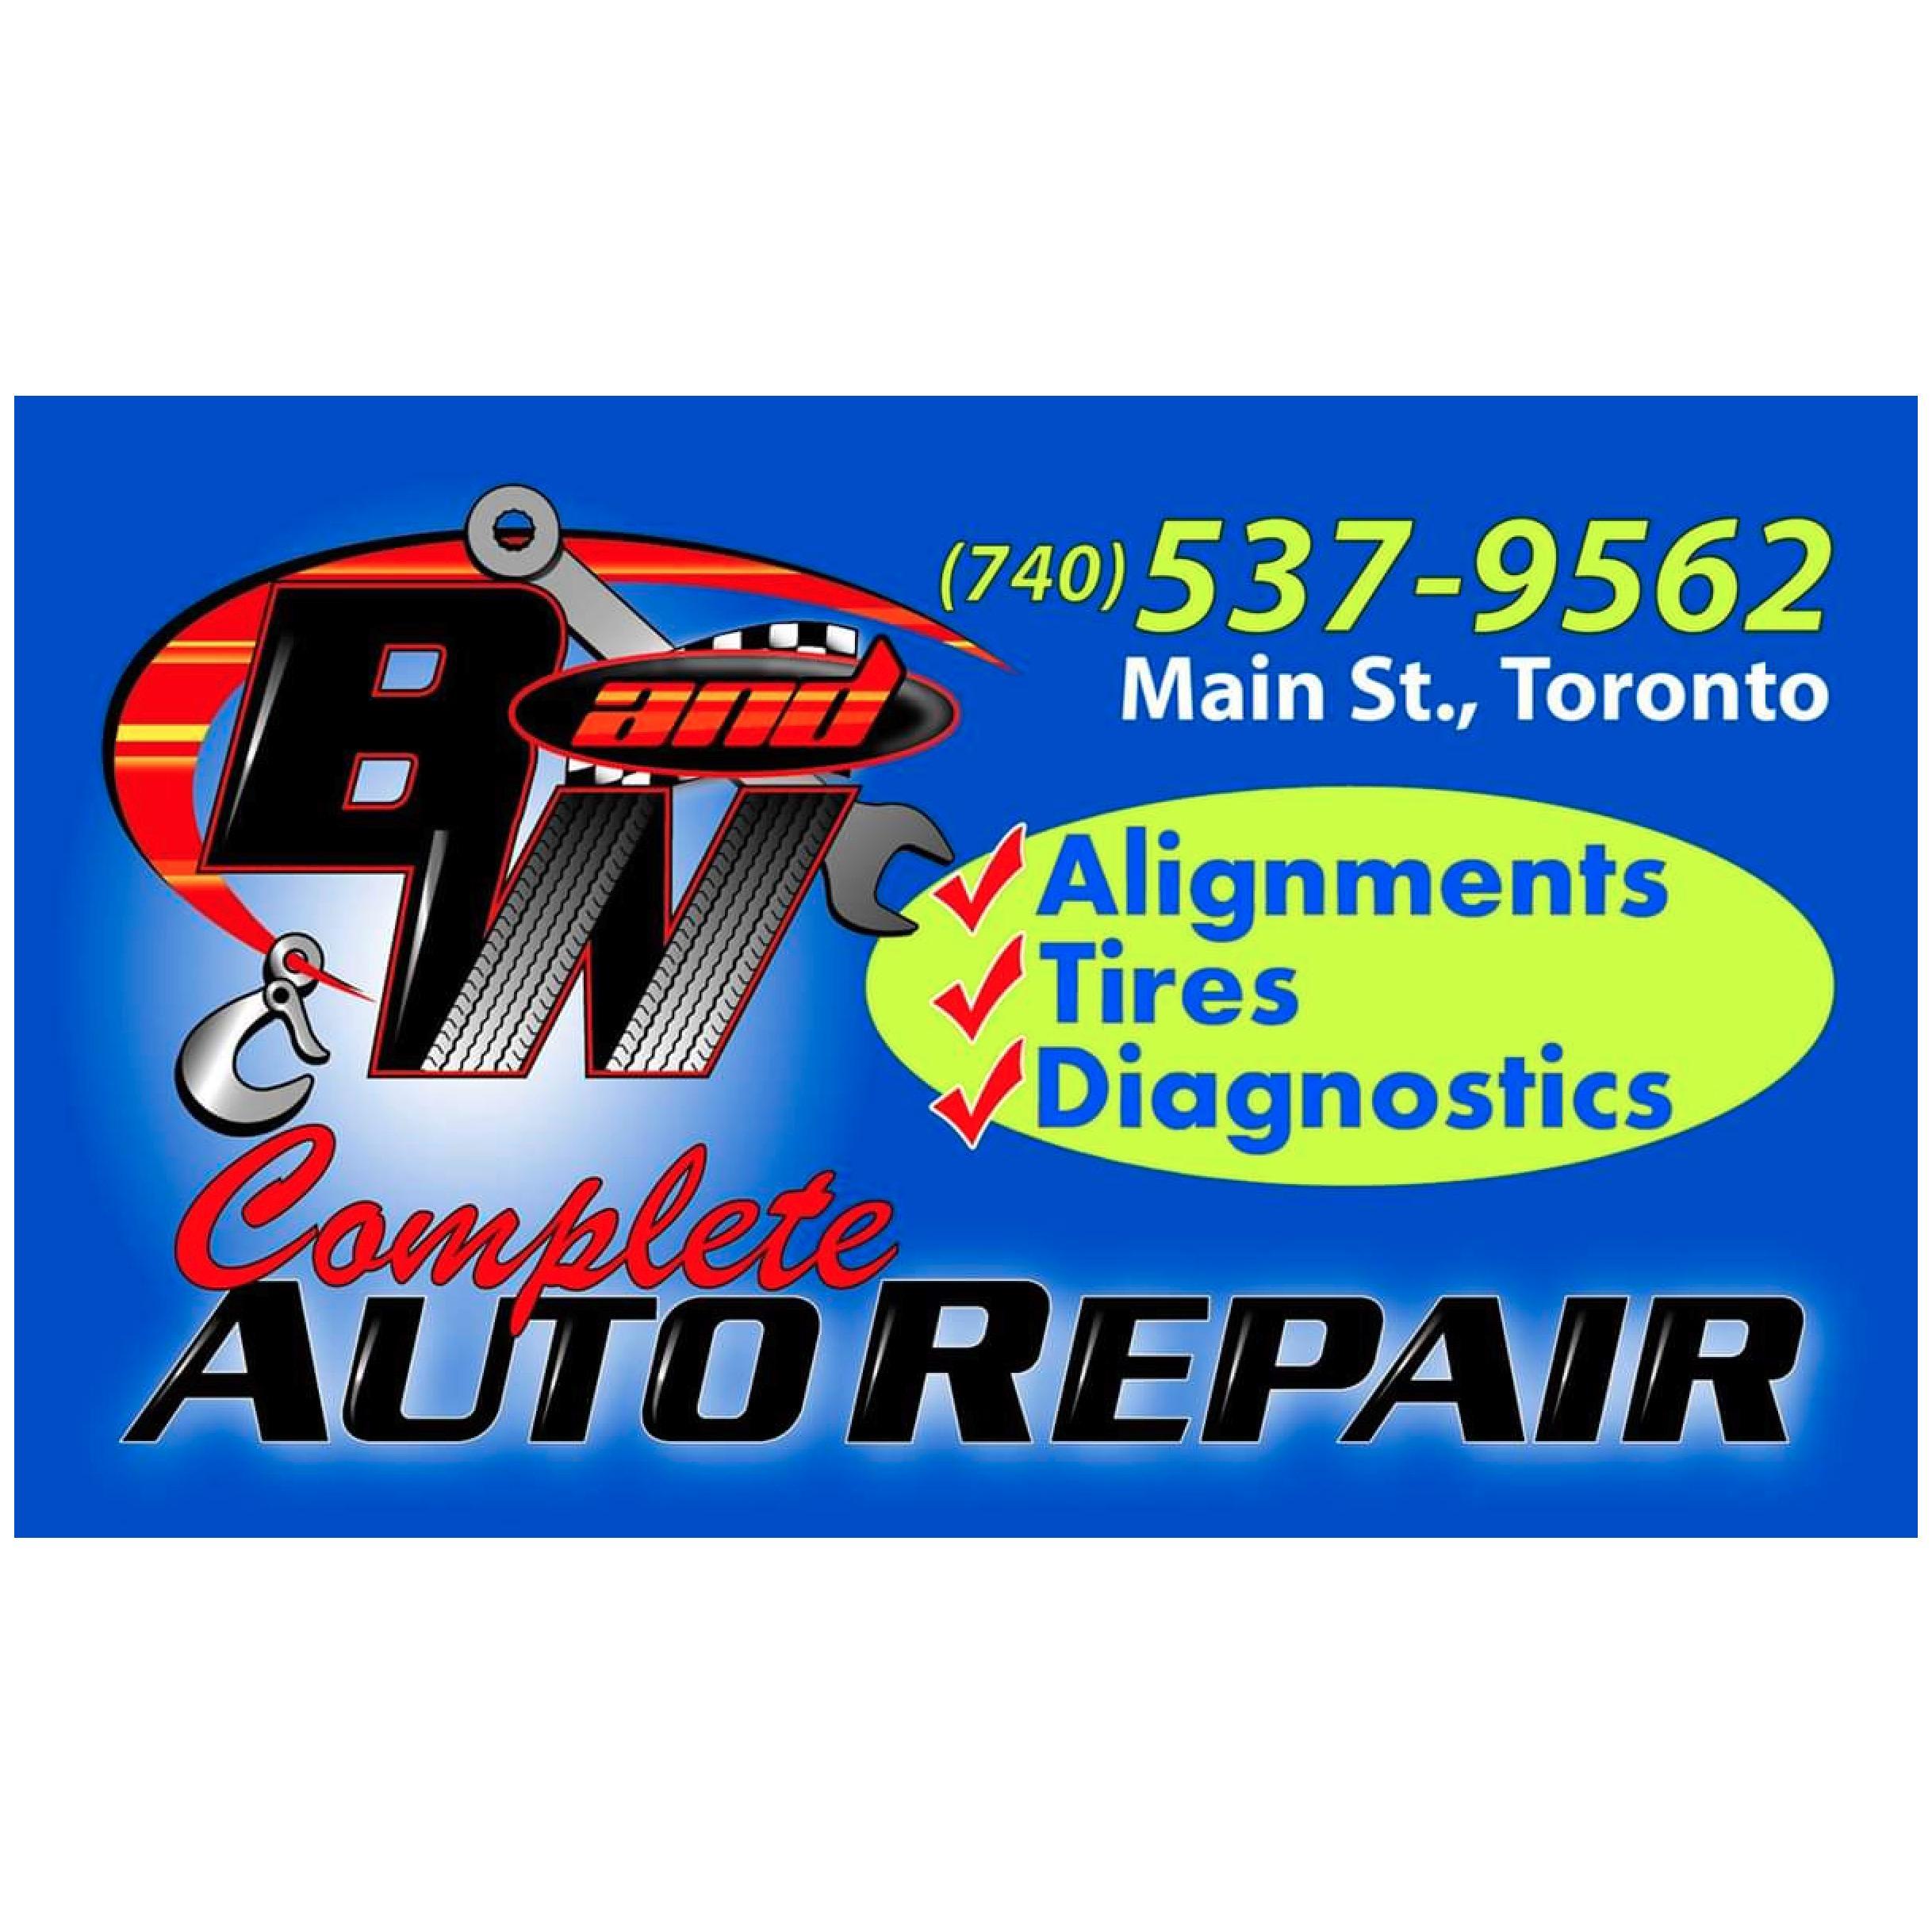 B & W Automotive Repair & Tire